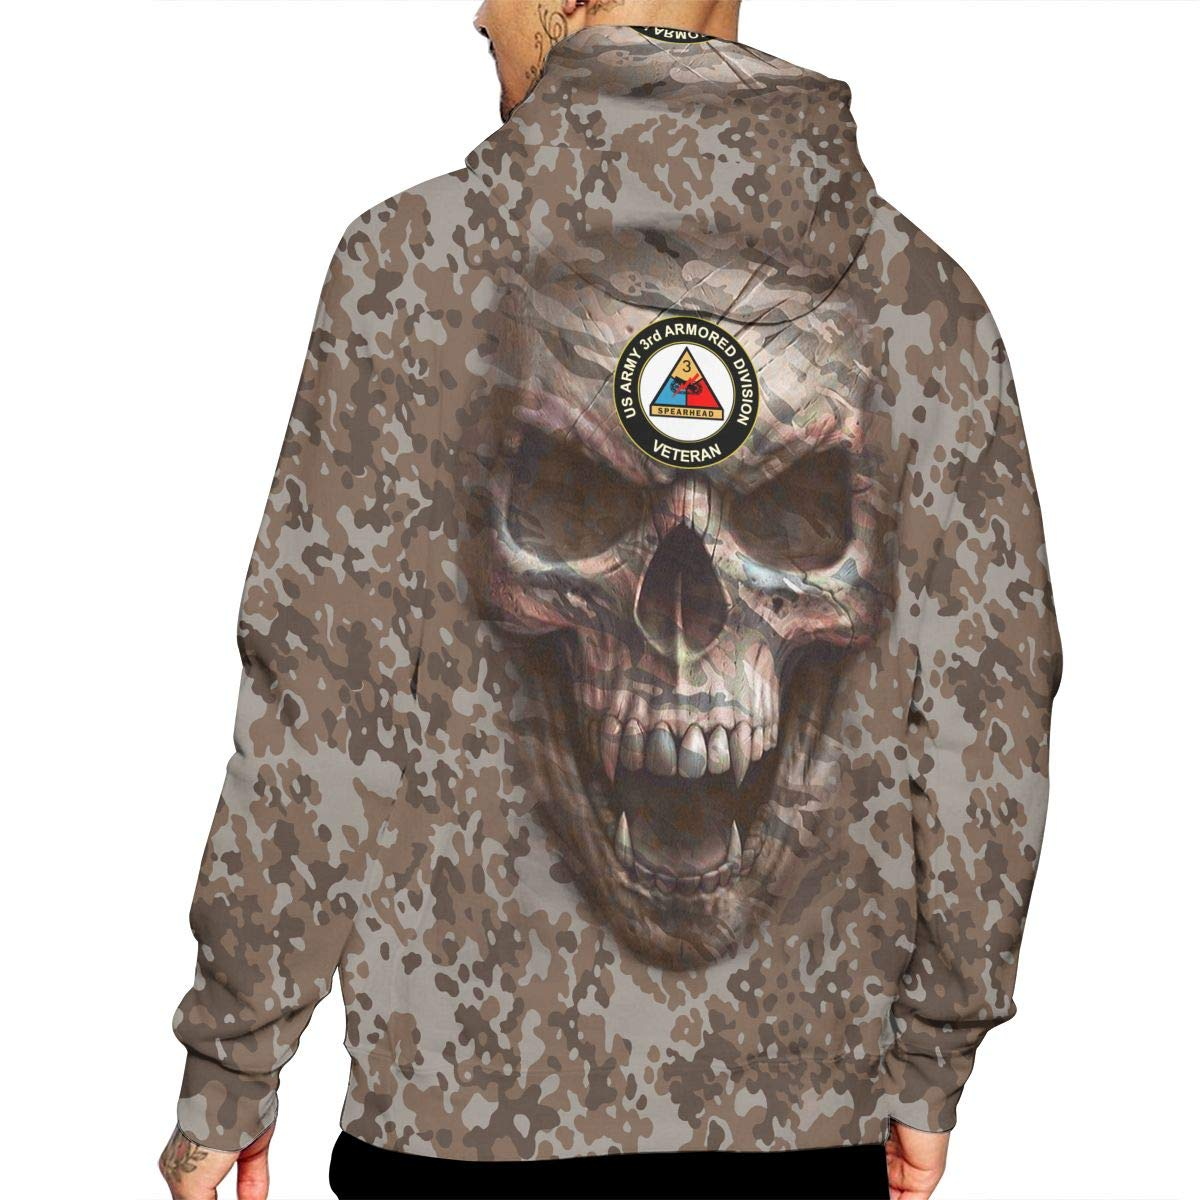 US Army Veteran 3rd Armored Division Unisex 3D Printed Pullover Hoodie Hooded Sweatshirt